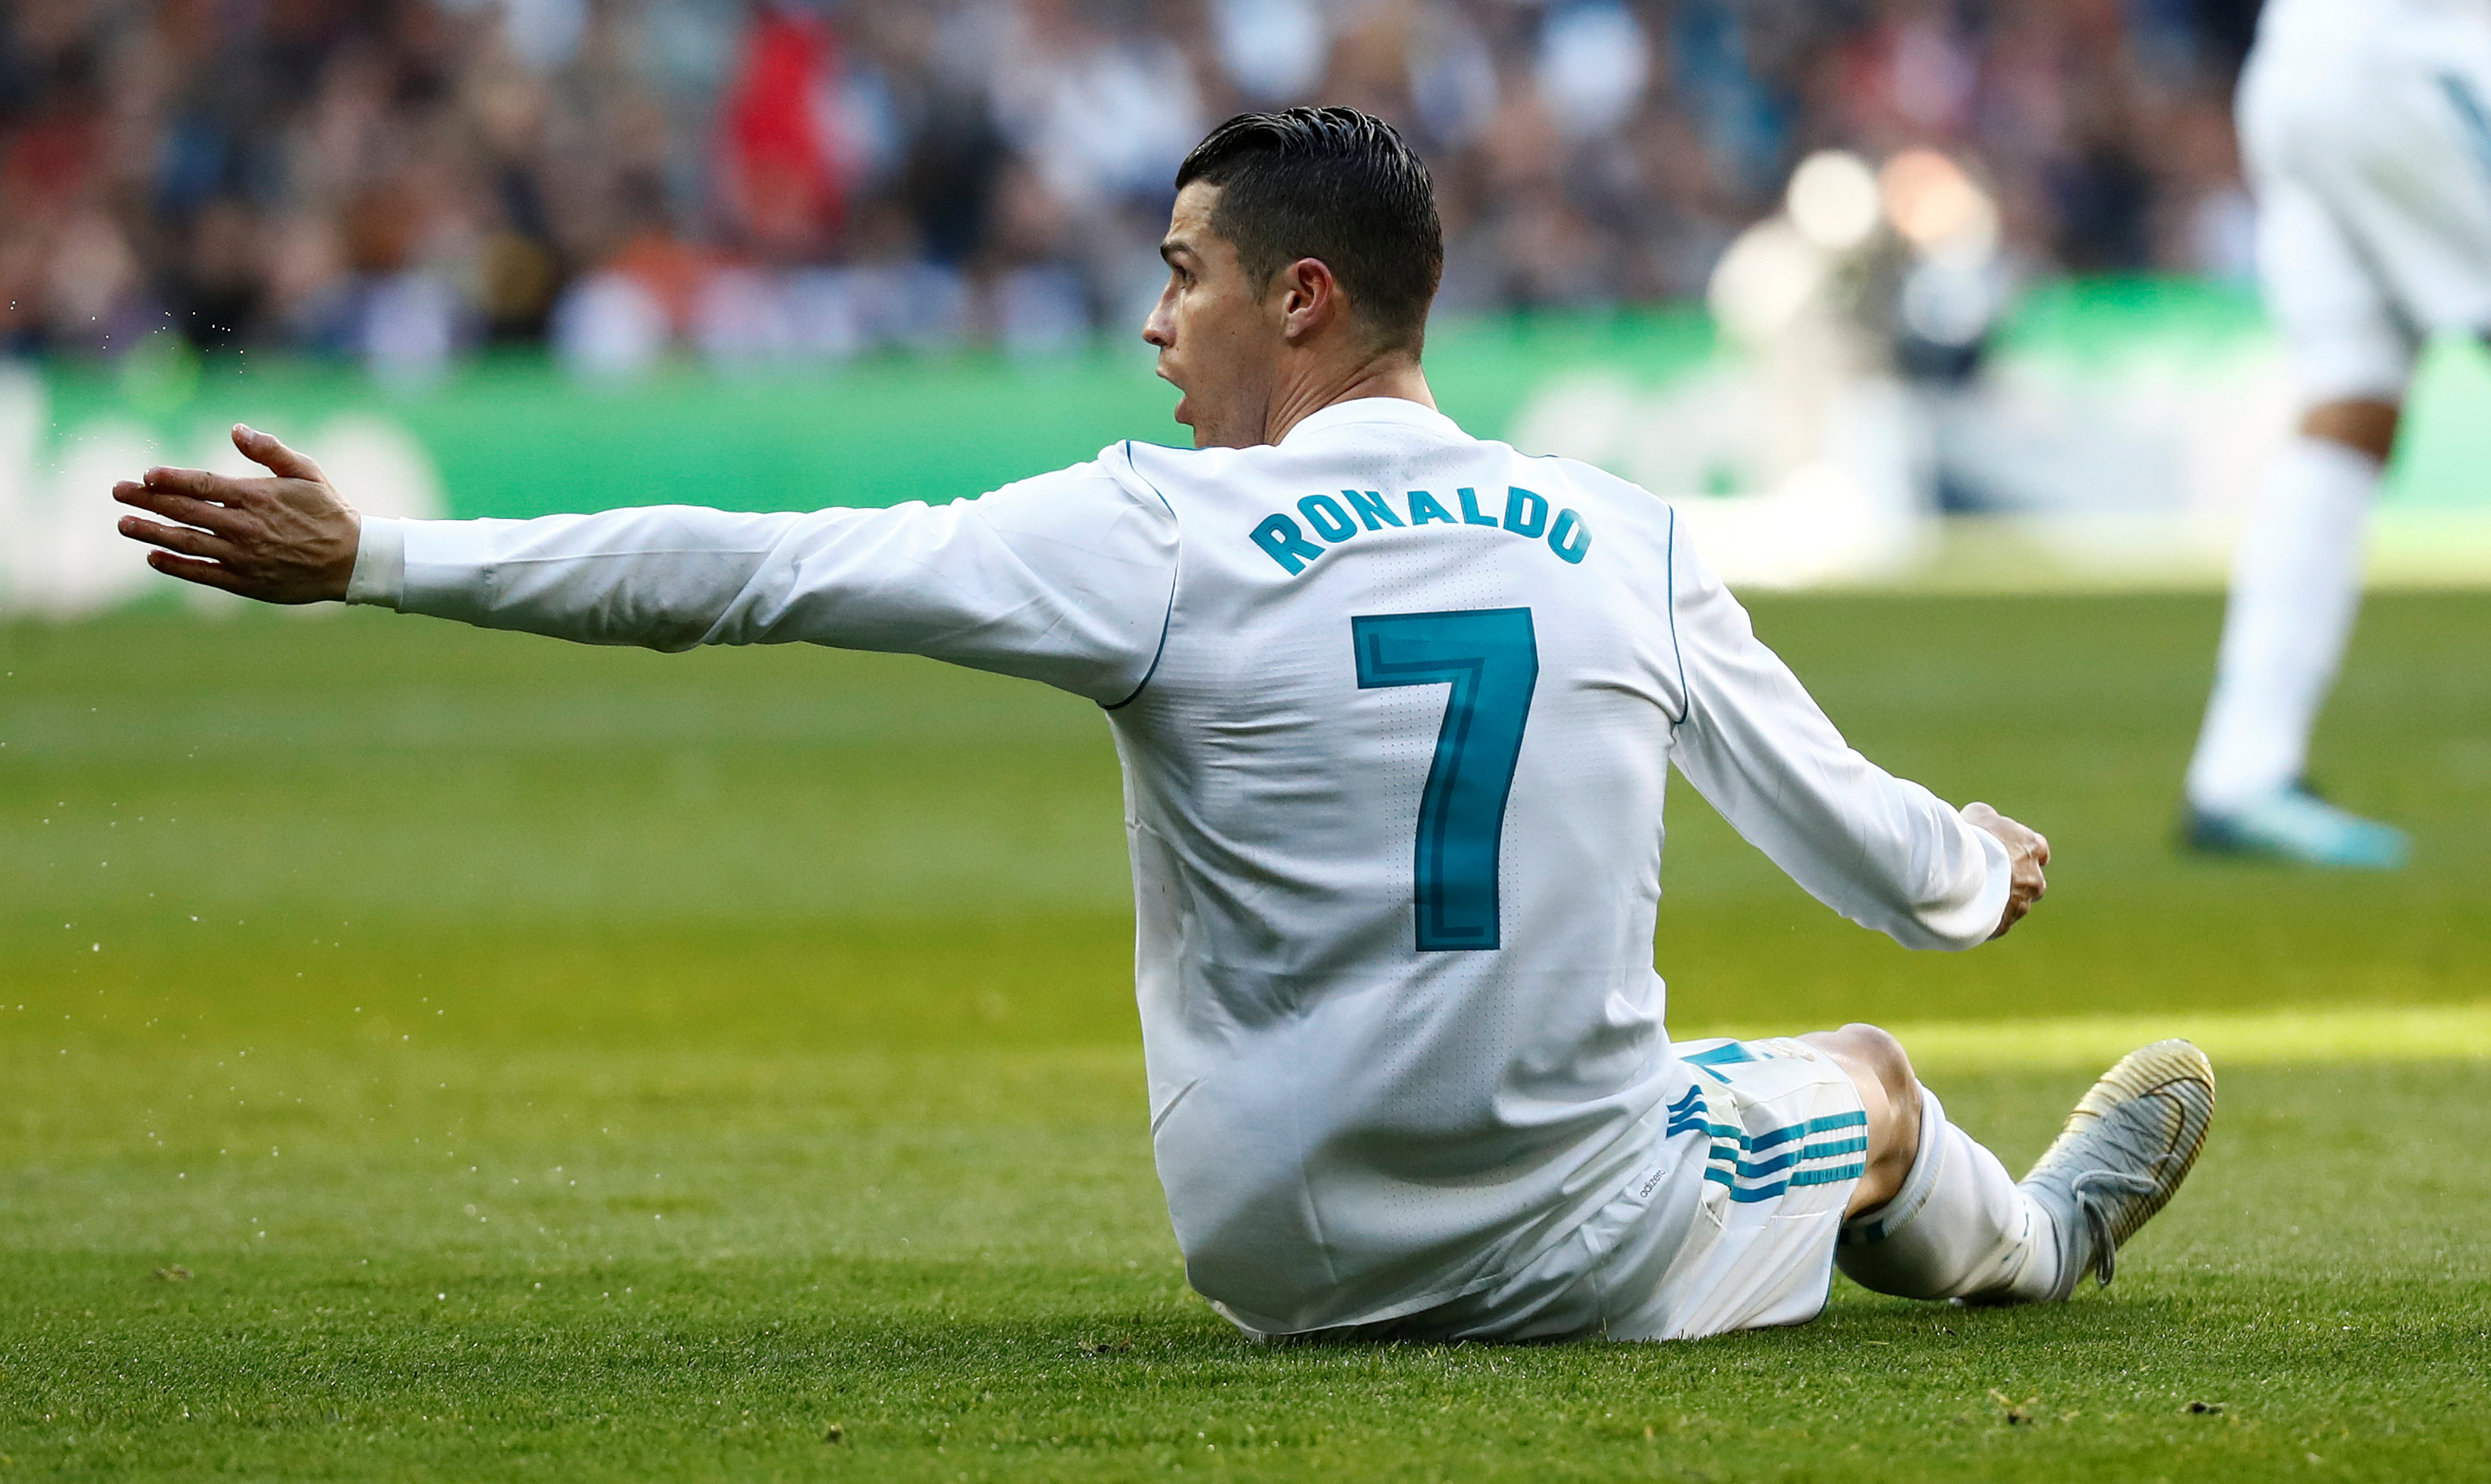 http://sport24.lefigaro.fr/var/plain_site/storage/images/football/transferts/actualites/en-direct-foot-mercato-rumeurs-transferts-vendredi-5-janvier-2017-891245/23887655-8-fre-FR/Le-mercato-en-direct-Et-on-reparle-de-Cristiano-Ronaldo-au-PSG.jpg